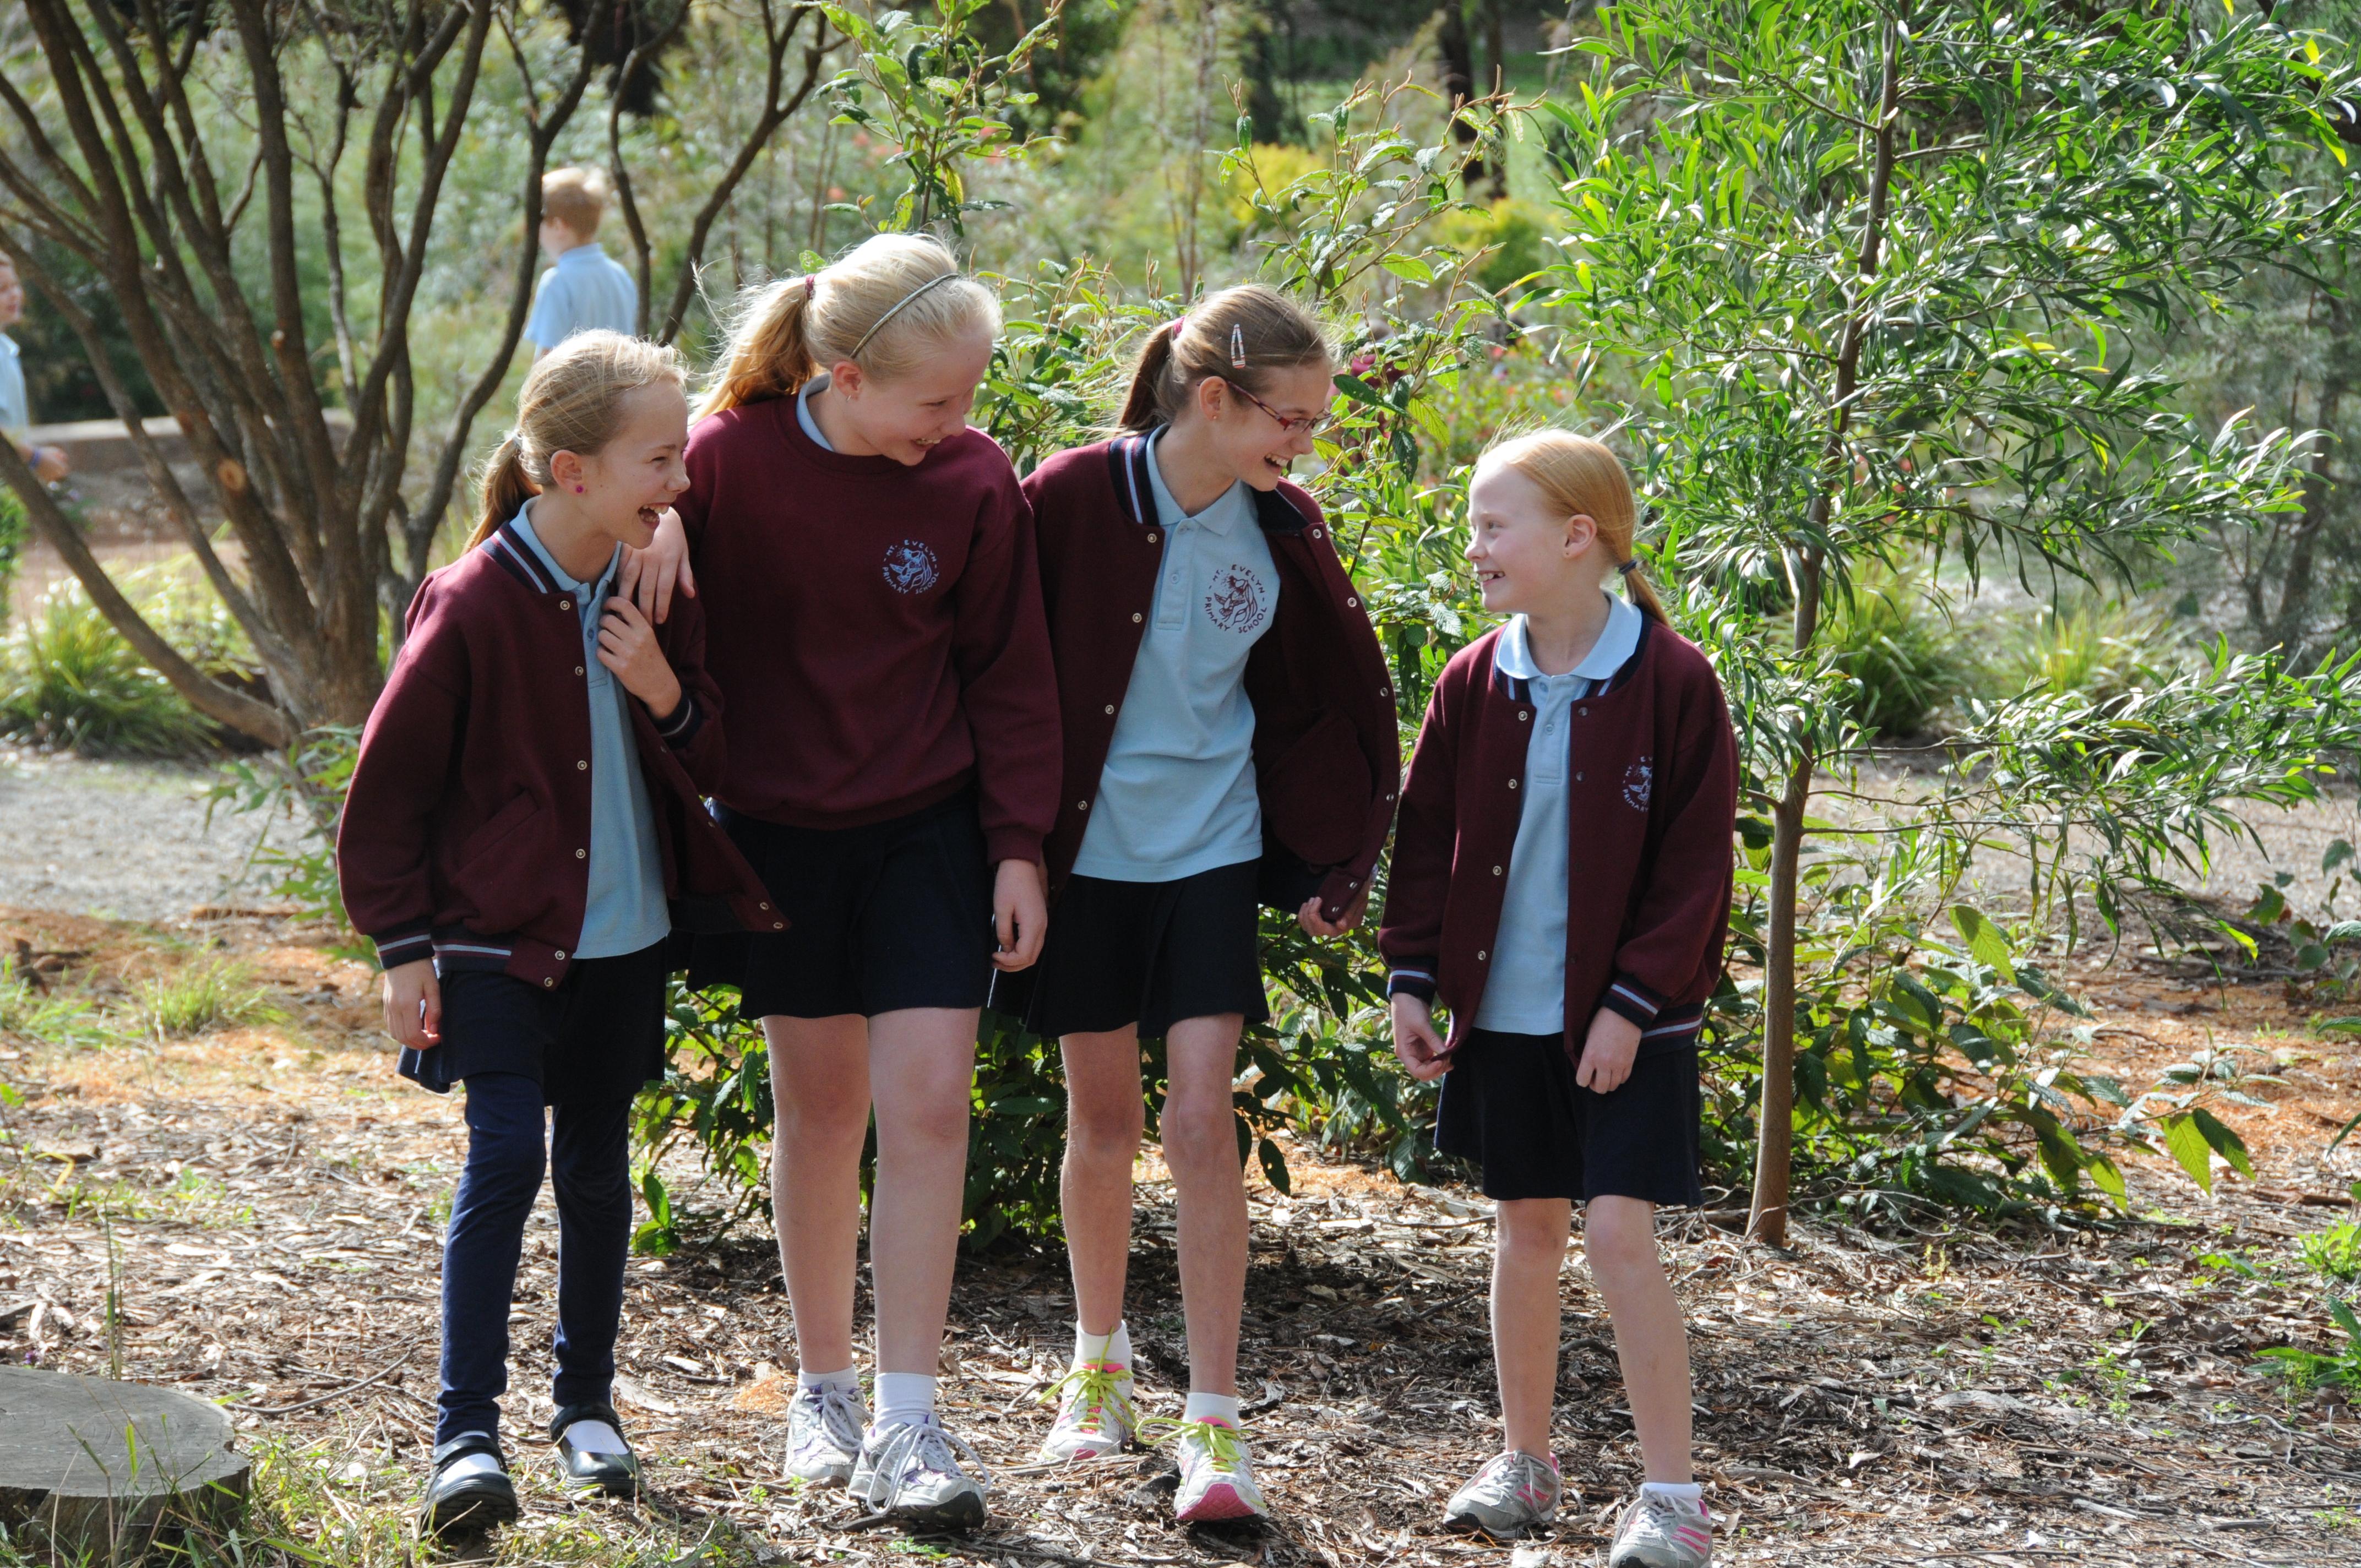 Mount Evelyn Primary School | 03 9736 2233